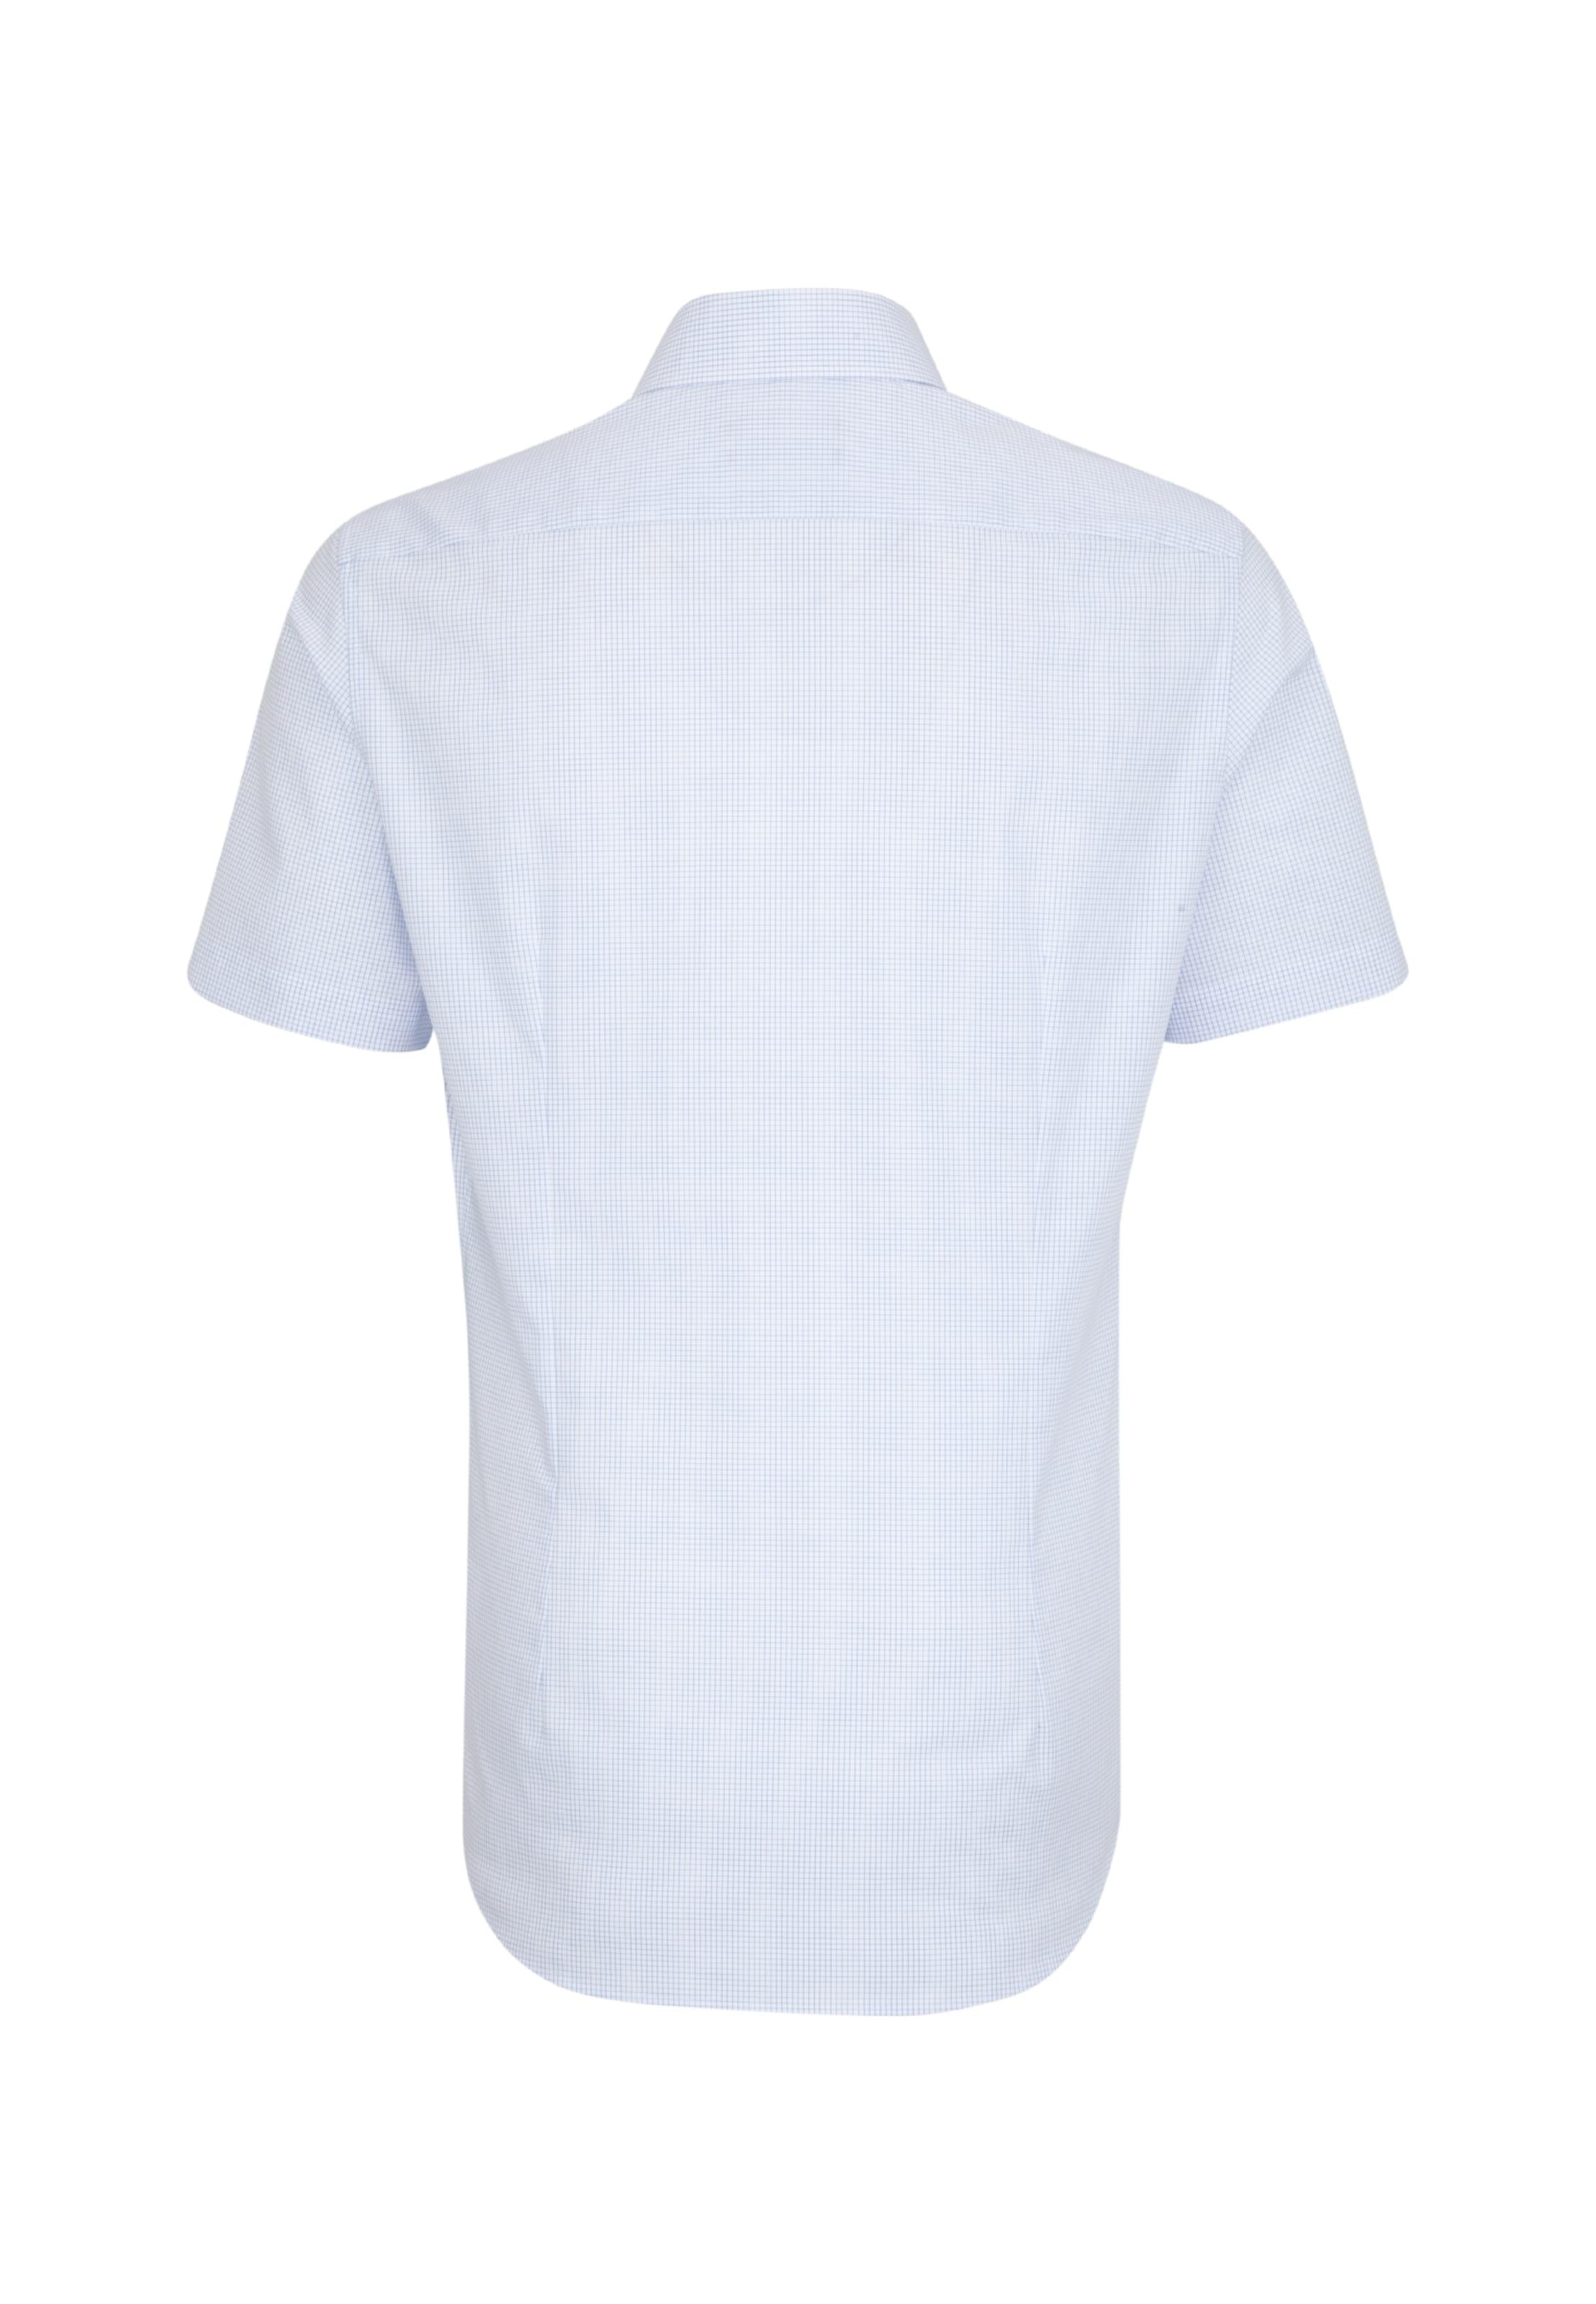 Seidensticker Hemd Seidensticker In HellblauWeiß Hemd T1FuK3l5Jc